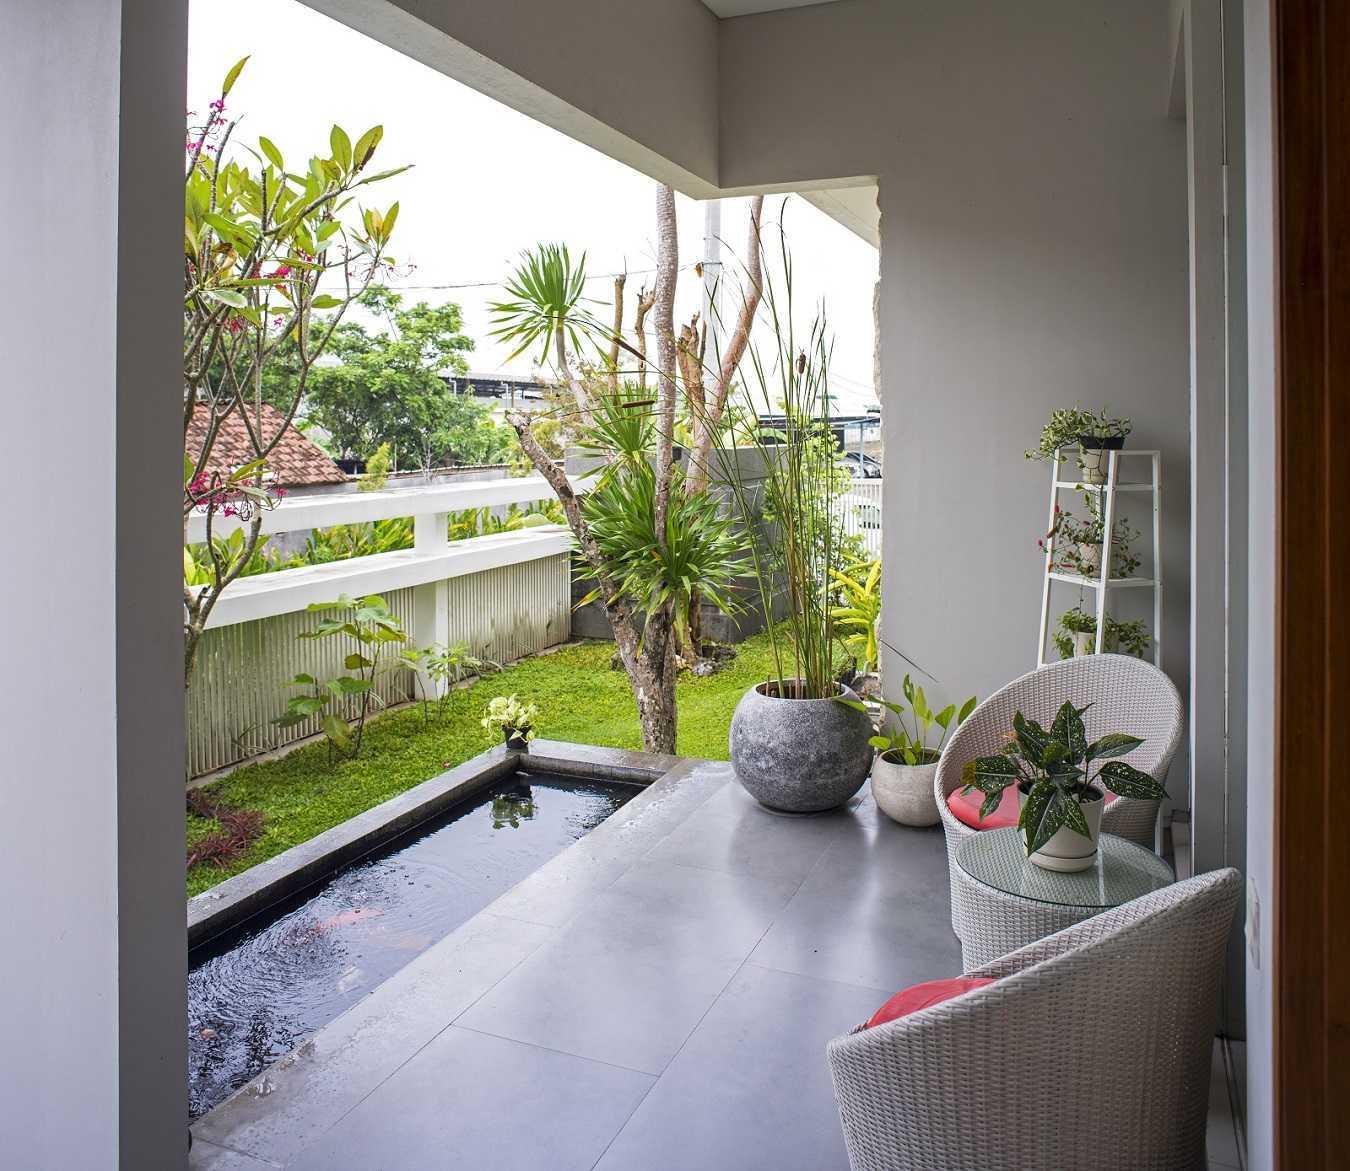 Satuvista Architect Rumah Tropis Hook Kabupaten Jombang, Jawa Timur, Indonesia Jawa Timur, Indonesia Terrace  48716